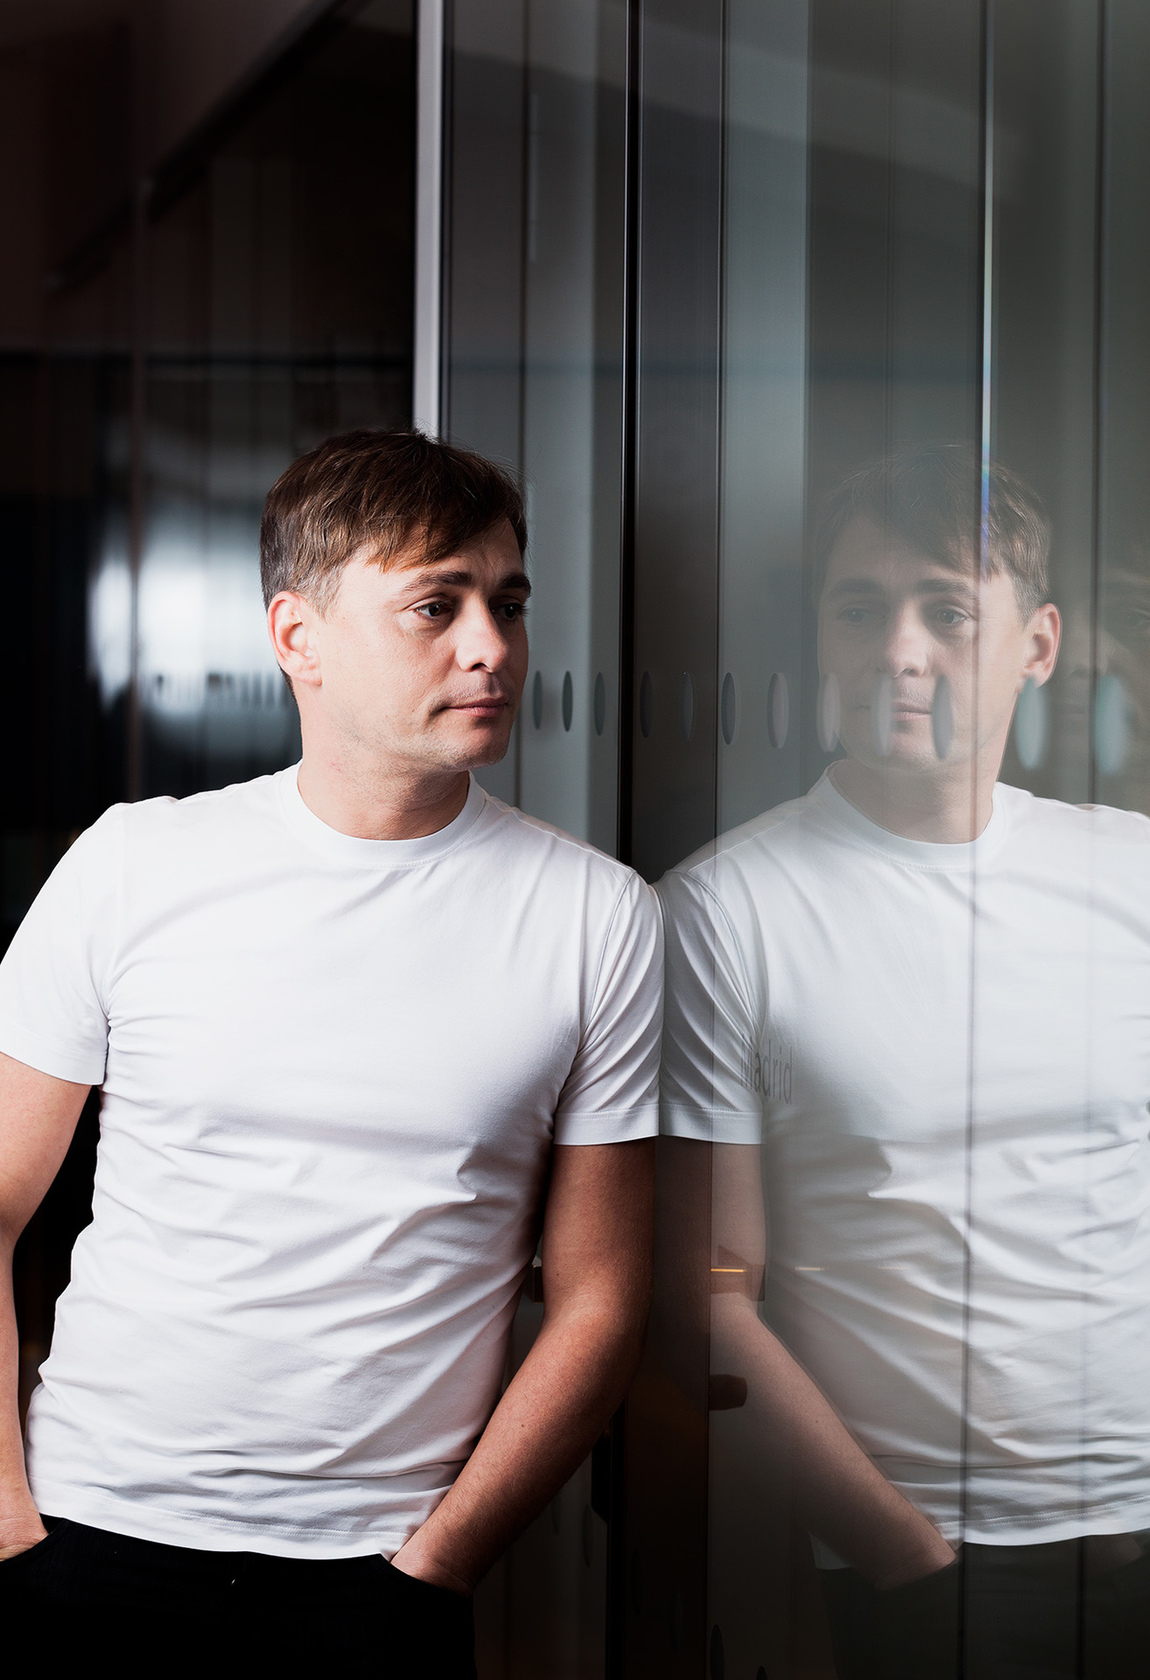 Aleksandr Zajac - Portraits - Badoo